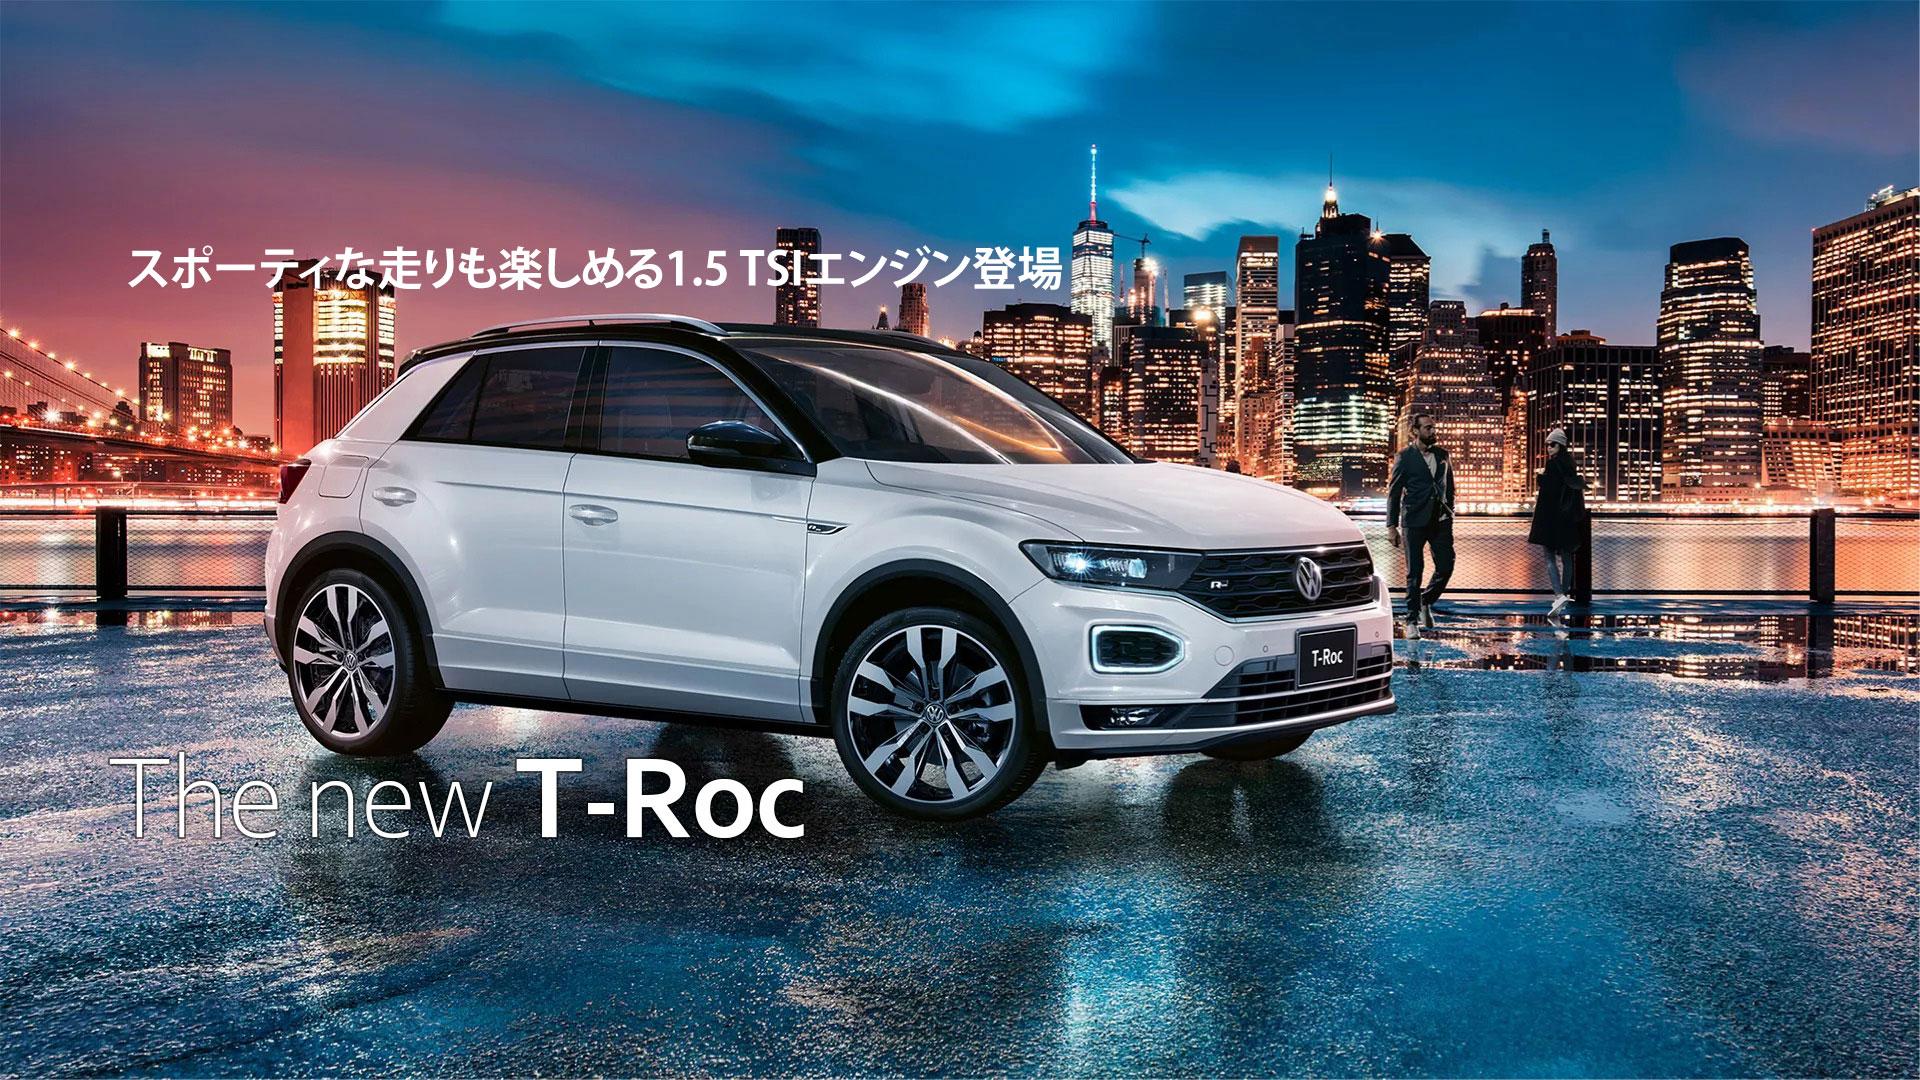 The new T-Roc